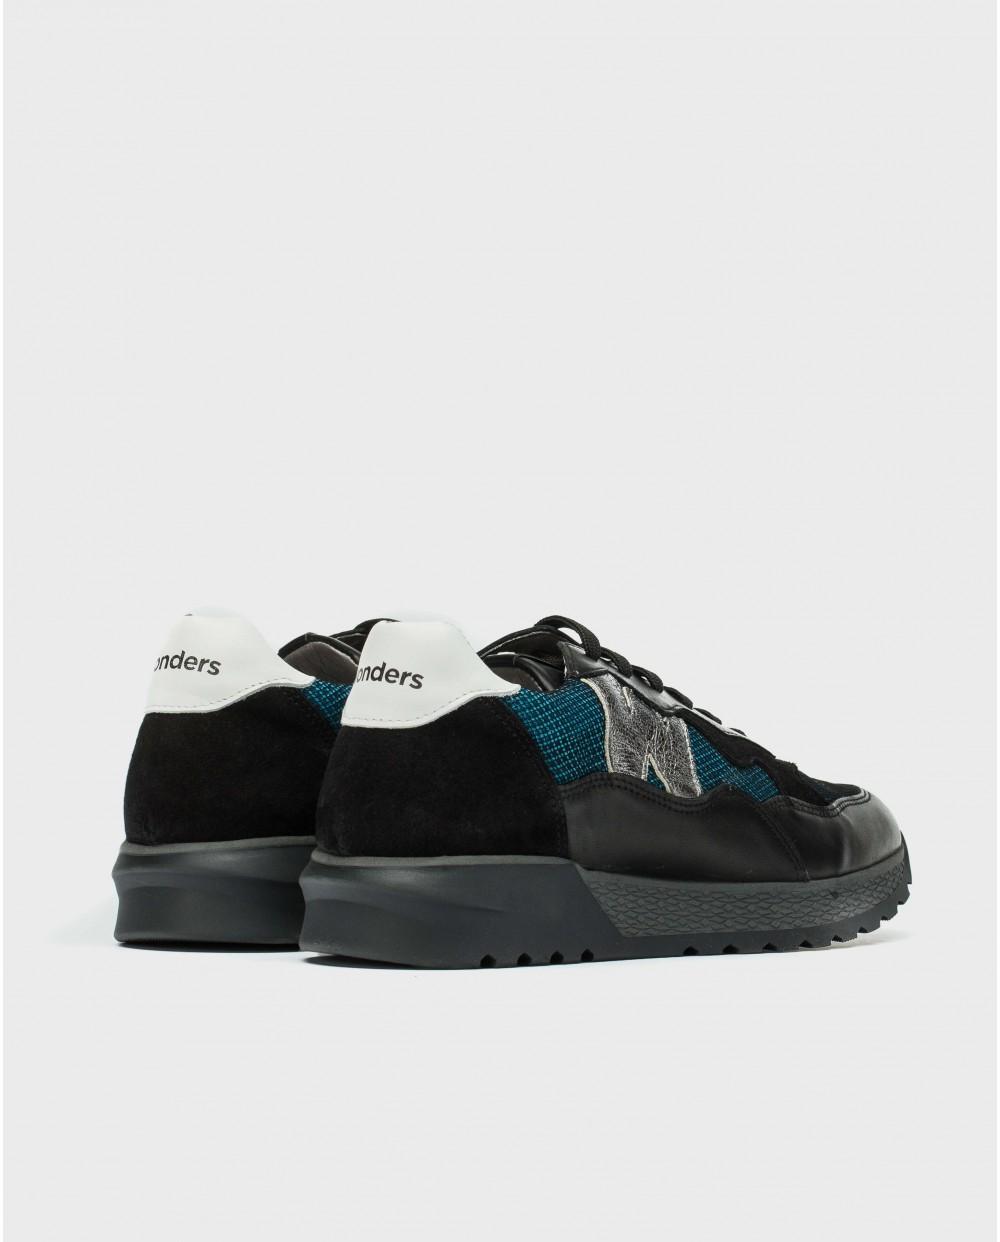 Wonders-Sneakers-Sneaker with leather logo